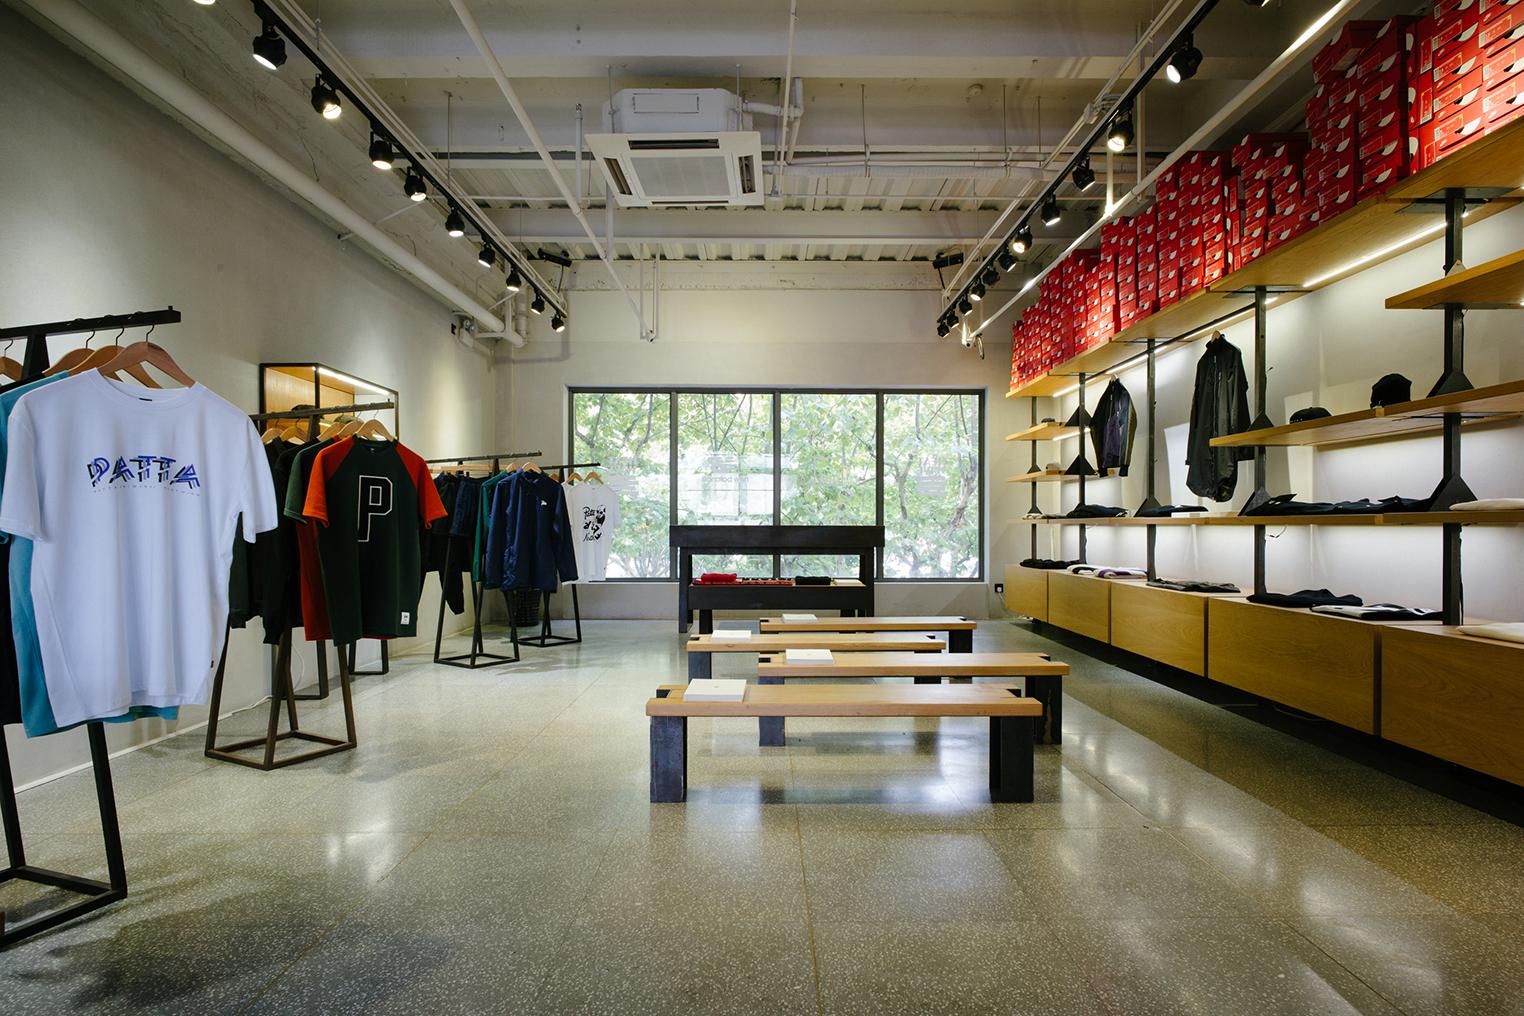 HEATWAVE @ DOE Shanghai Pop-up With Patta, Futur & Han Kjobenhavn